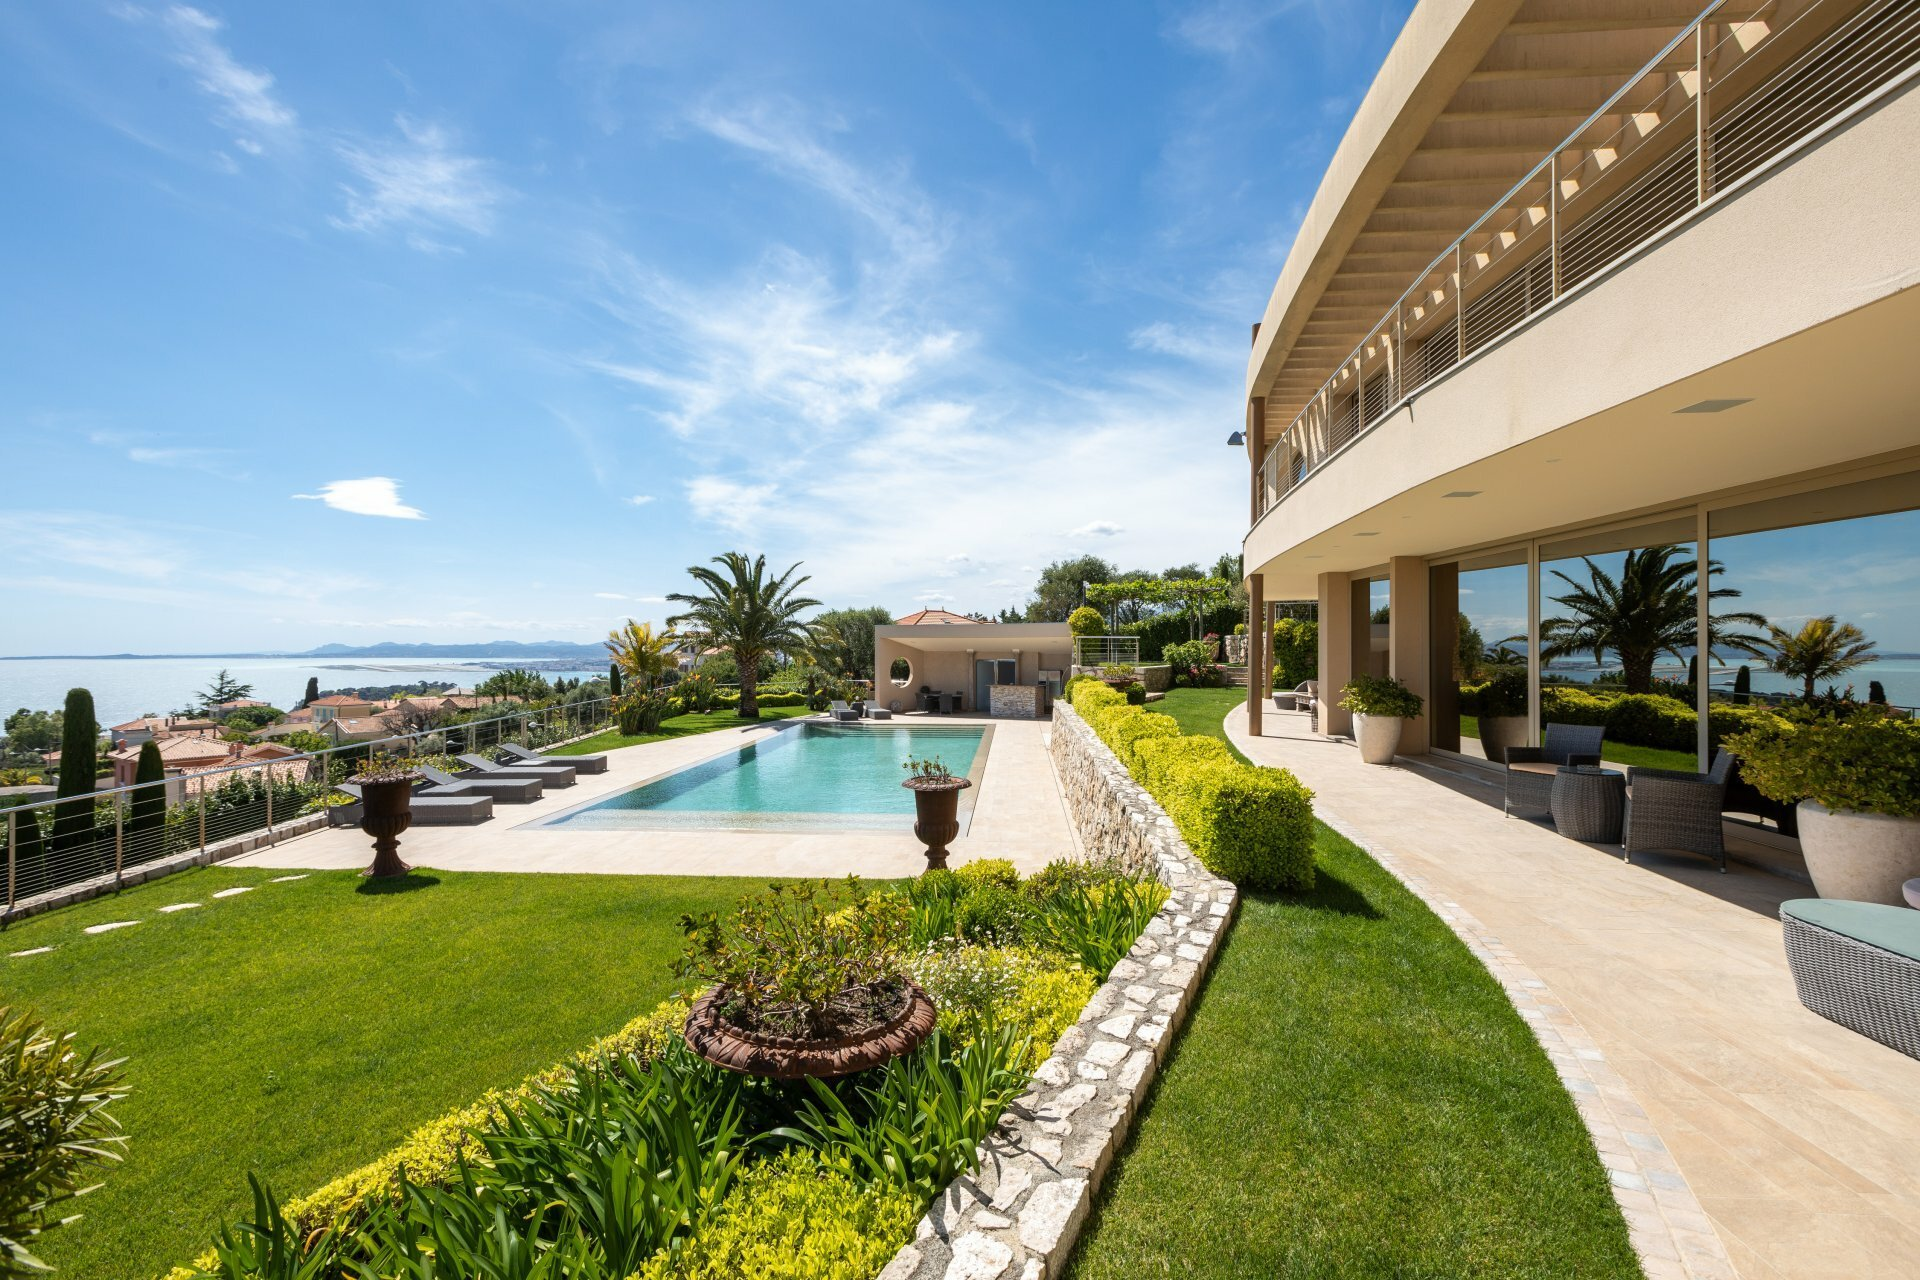 Villa in Nice, Provence-Alpes-Côte d'Azur, France 1 - 11569372